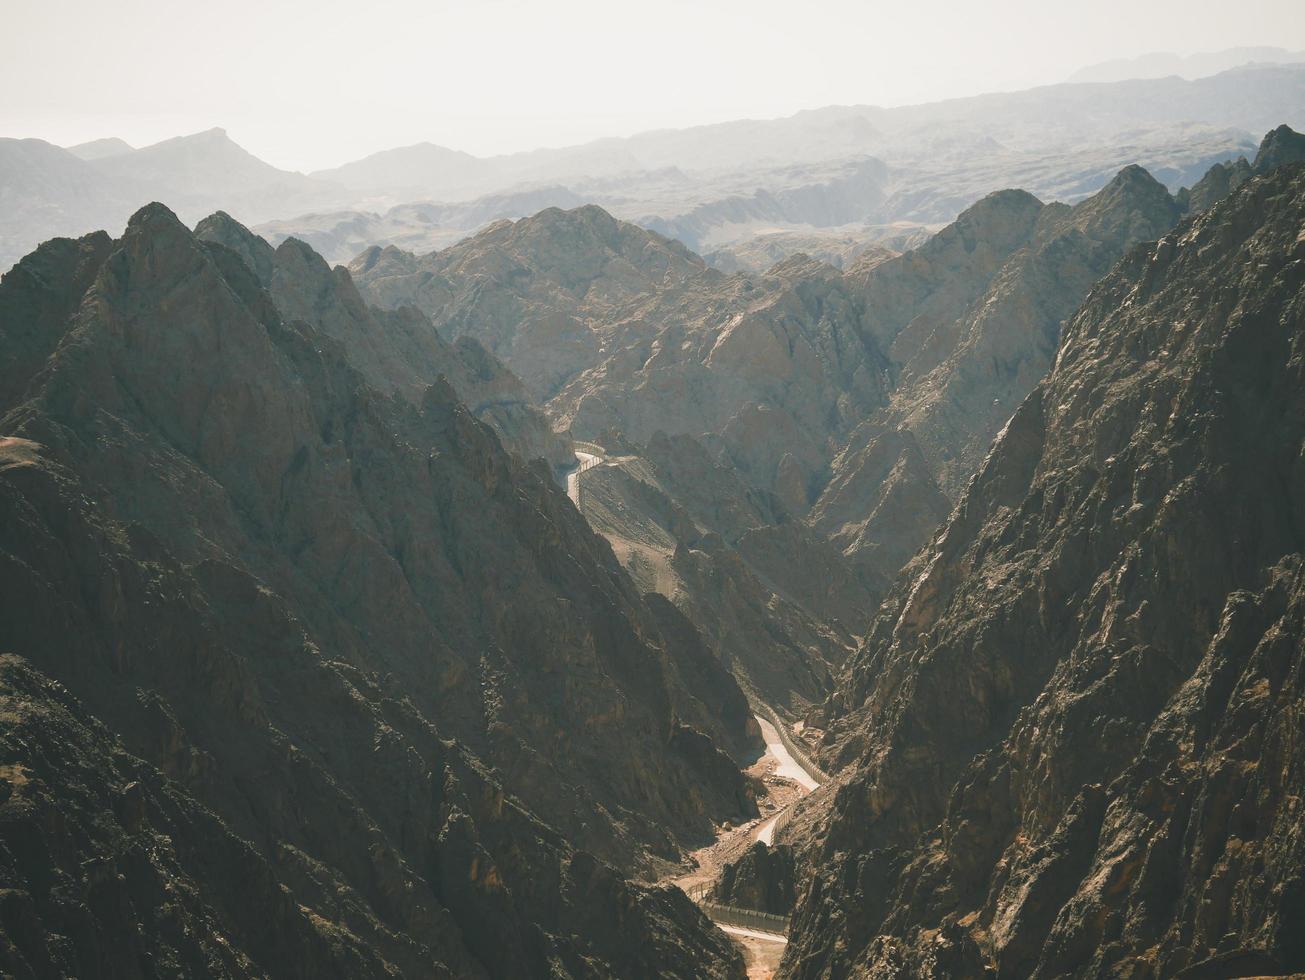 Hazy view of valley photo